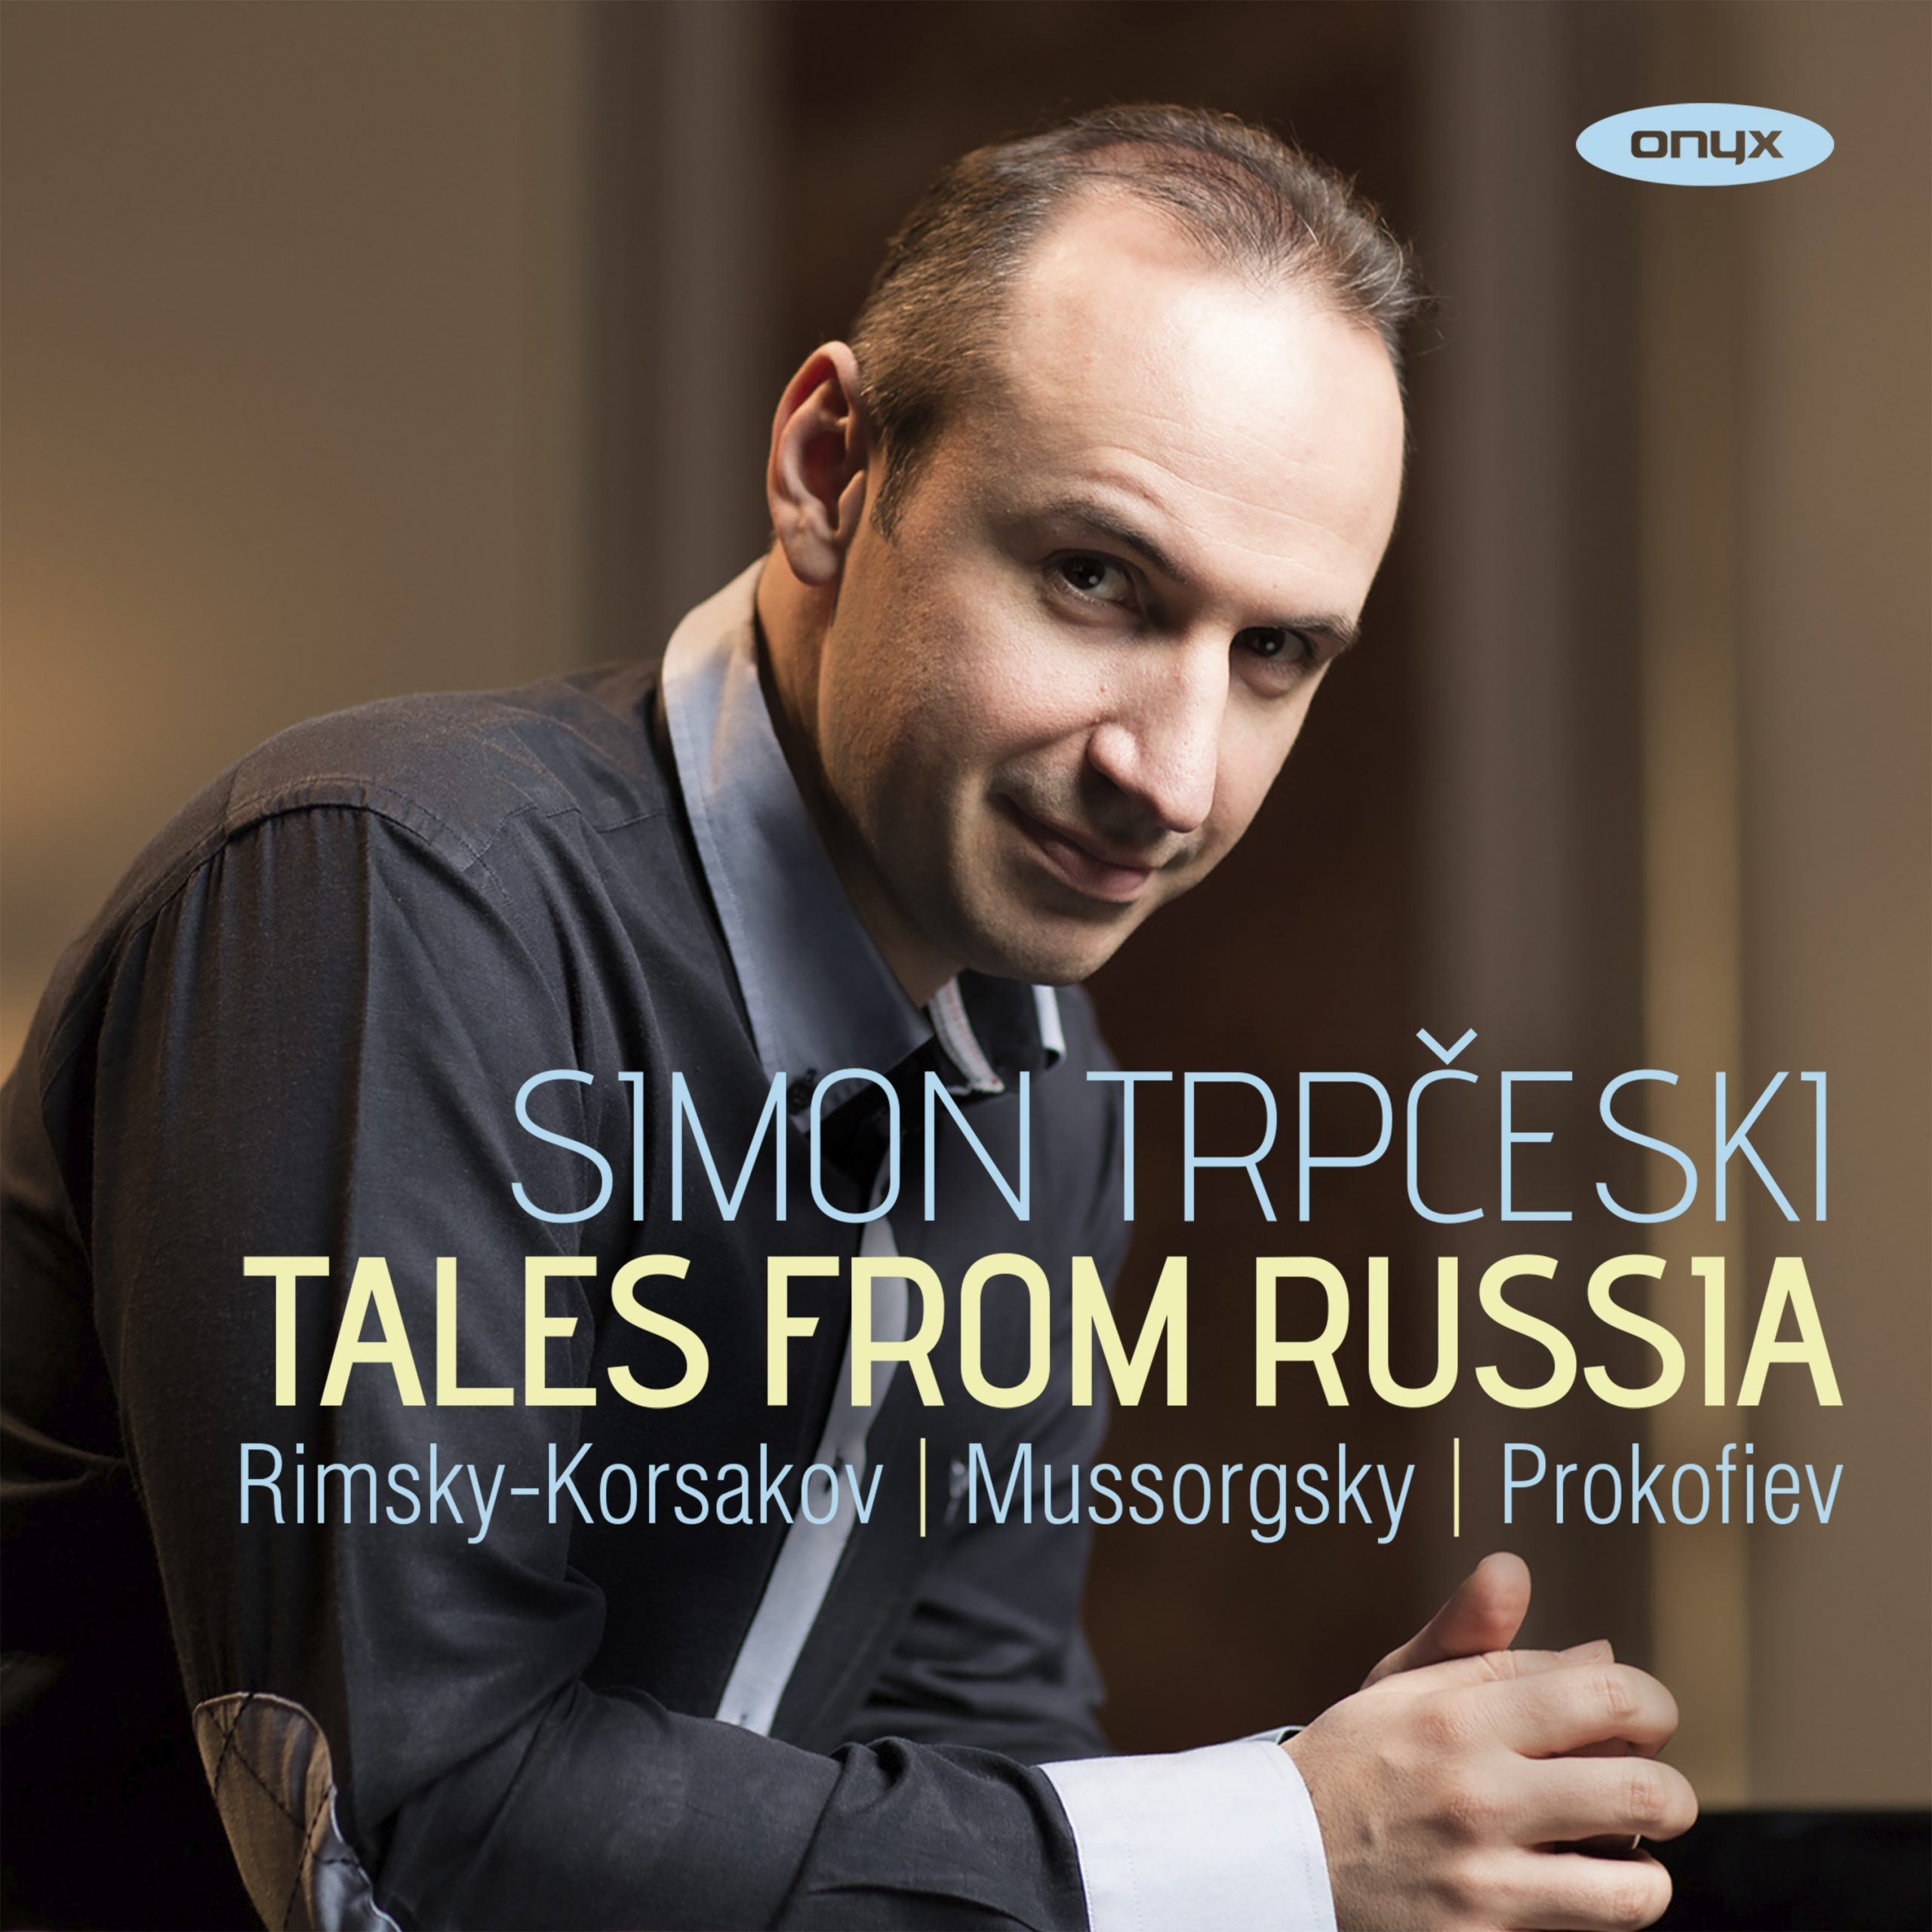 Tales from Russia – Rimsky-Korsakov: Scheherazade (Arr. Piano) / Mussorgsky / Prokofiev